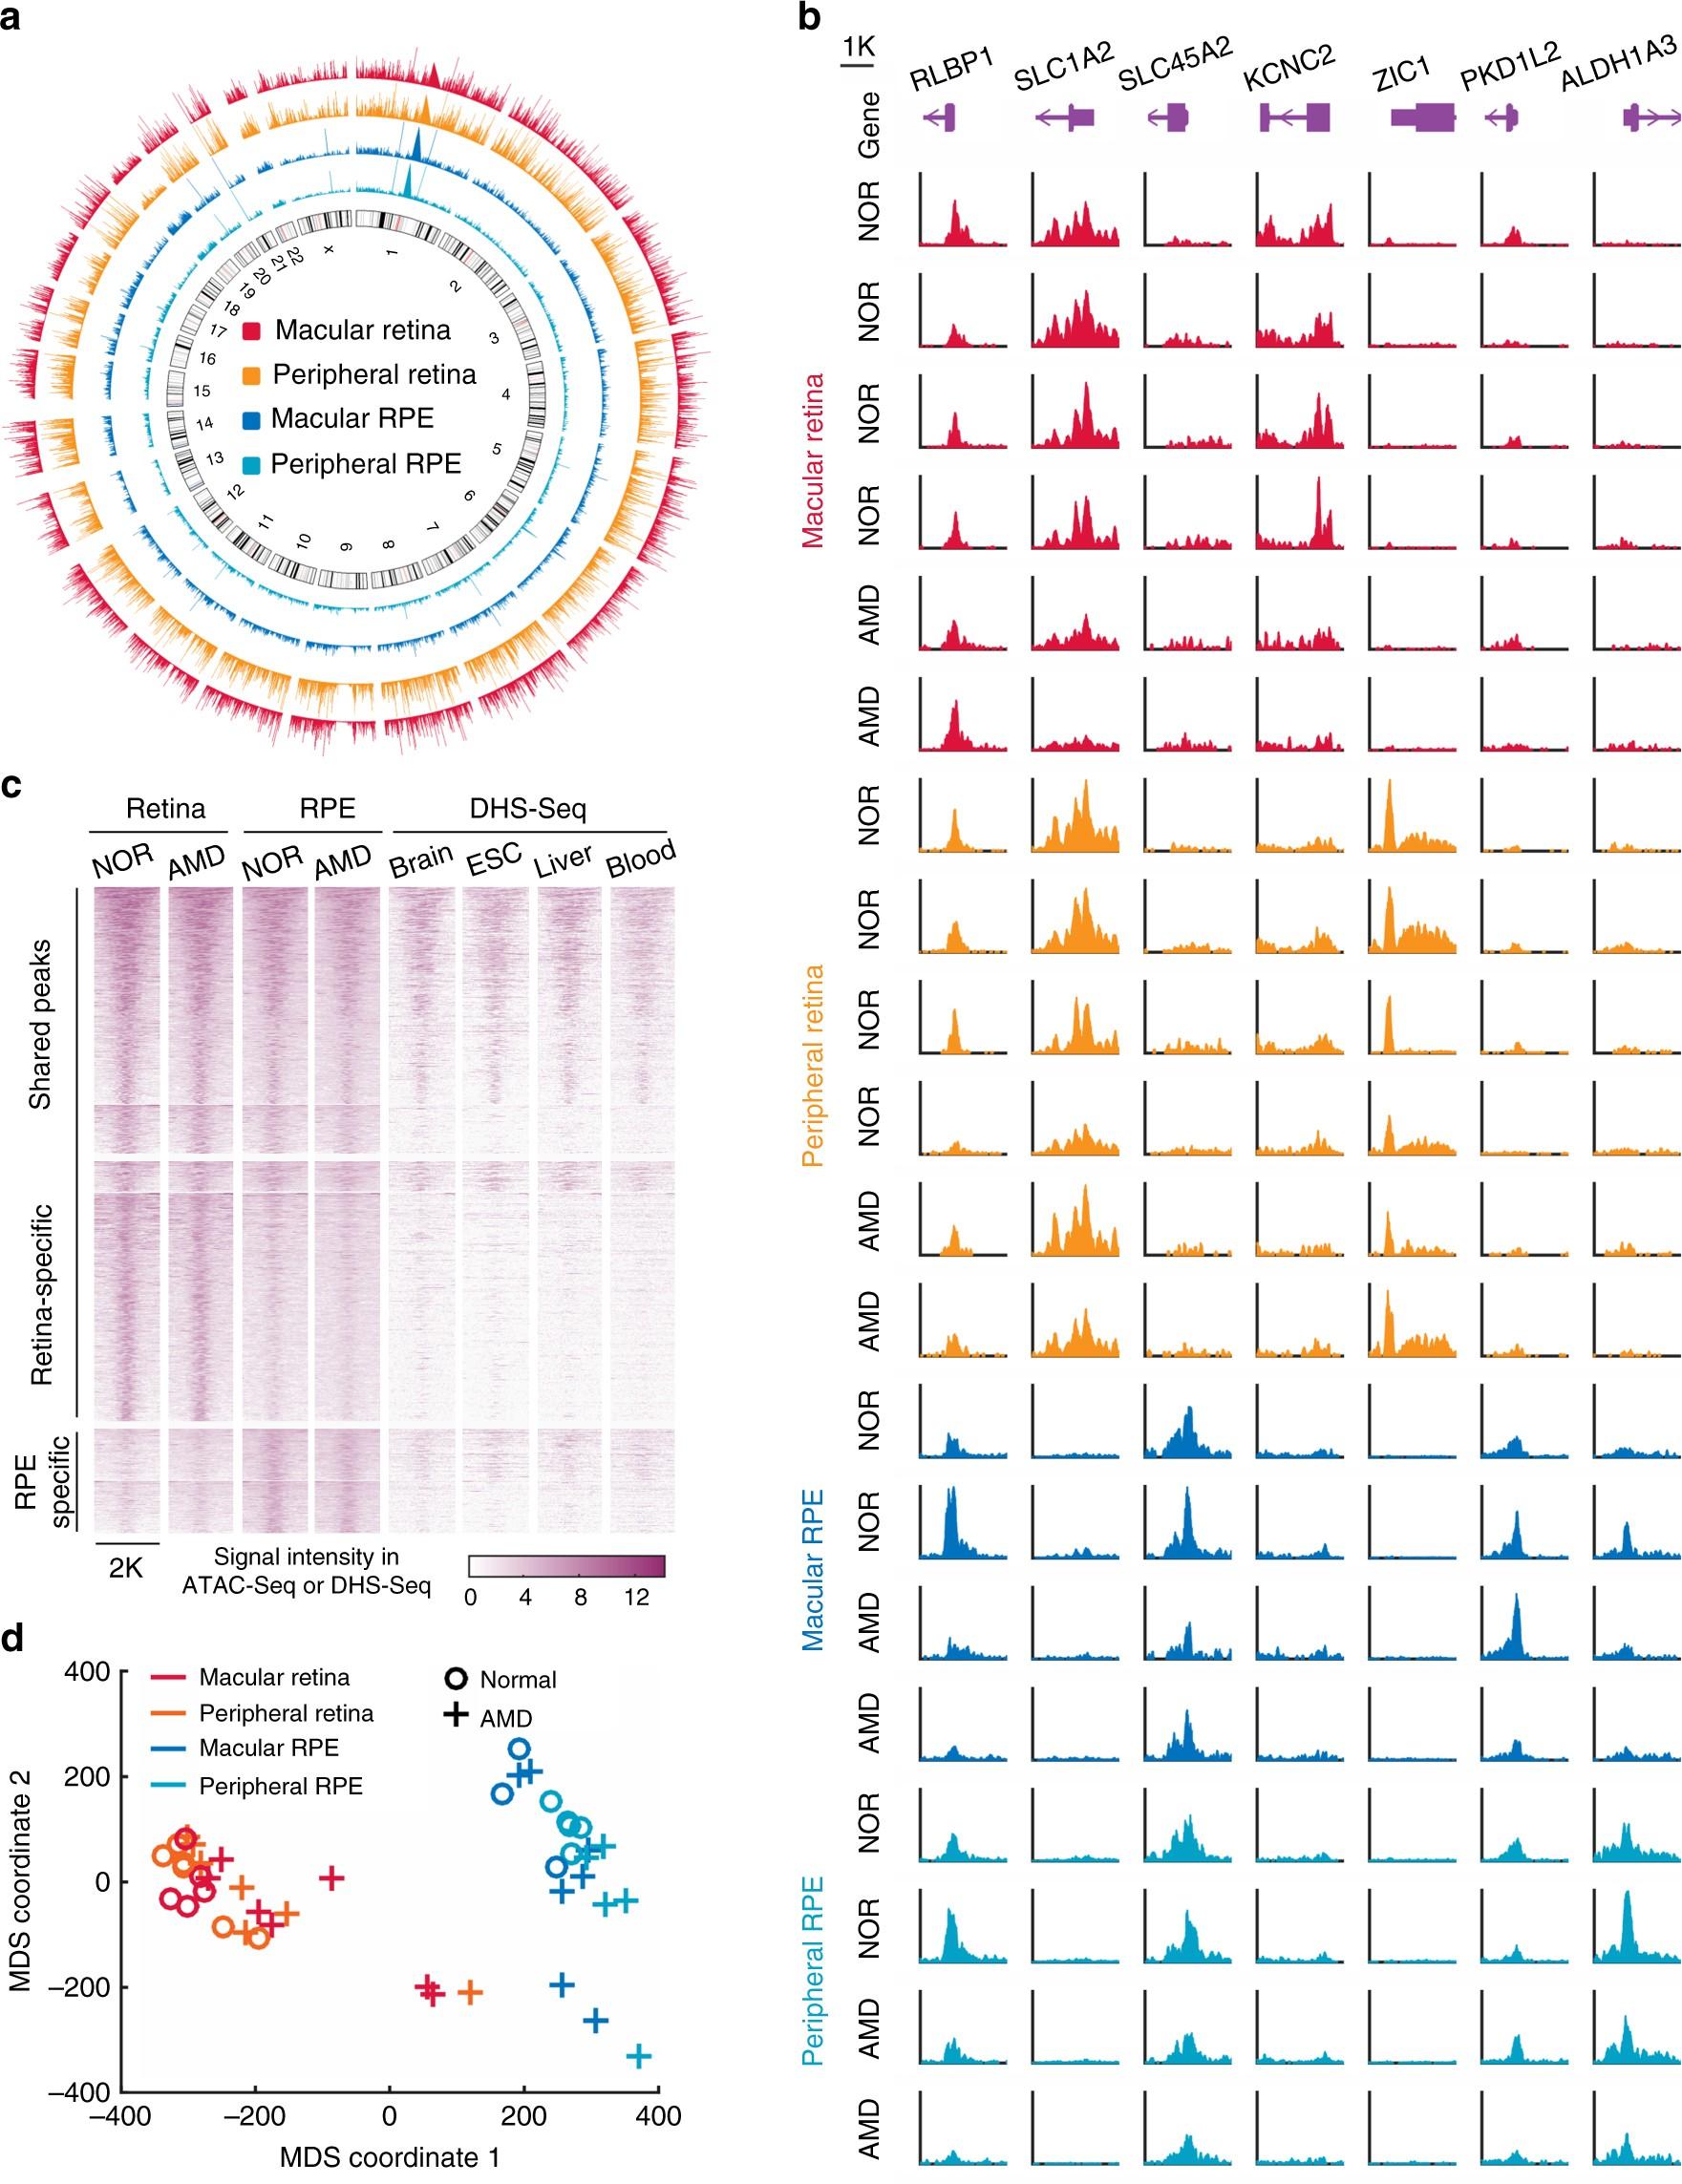 ATAC-Seq analysis reveals a widespread decrease of chromatin